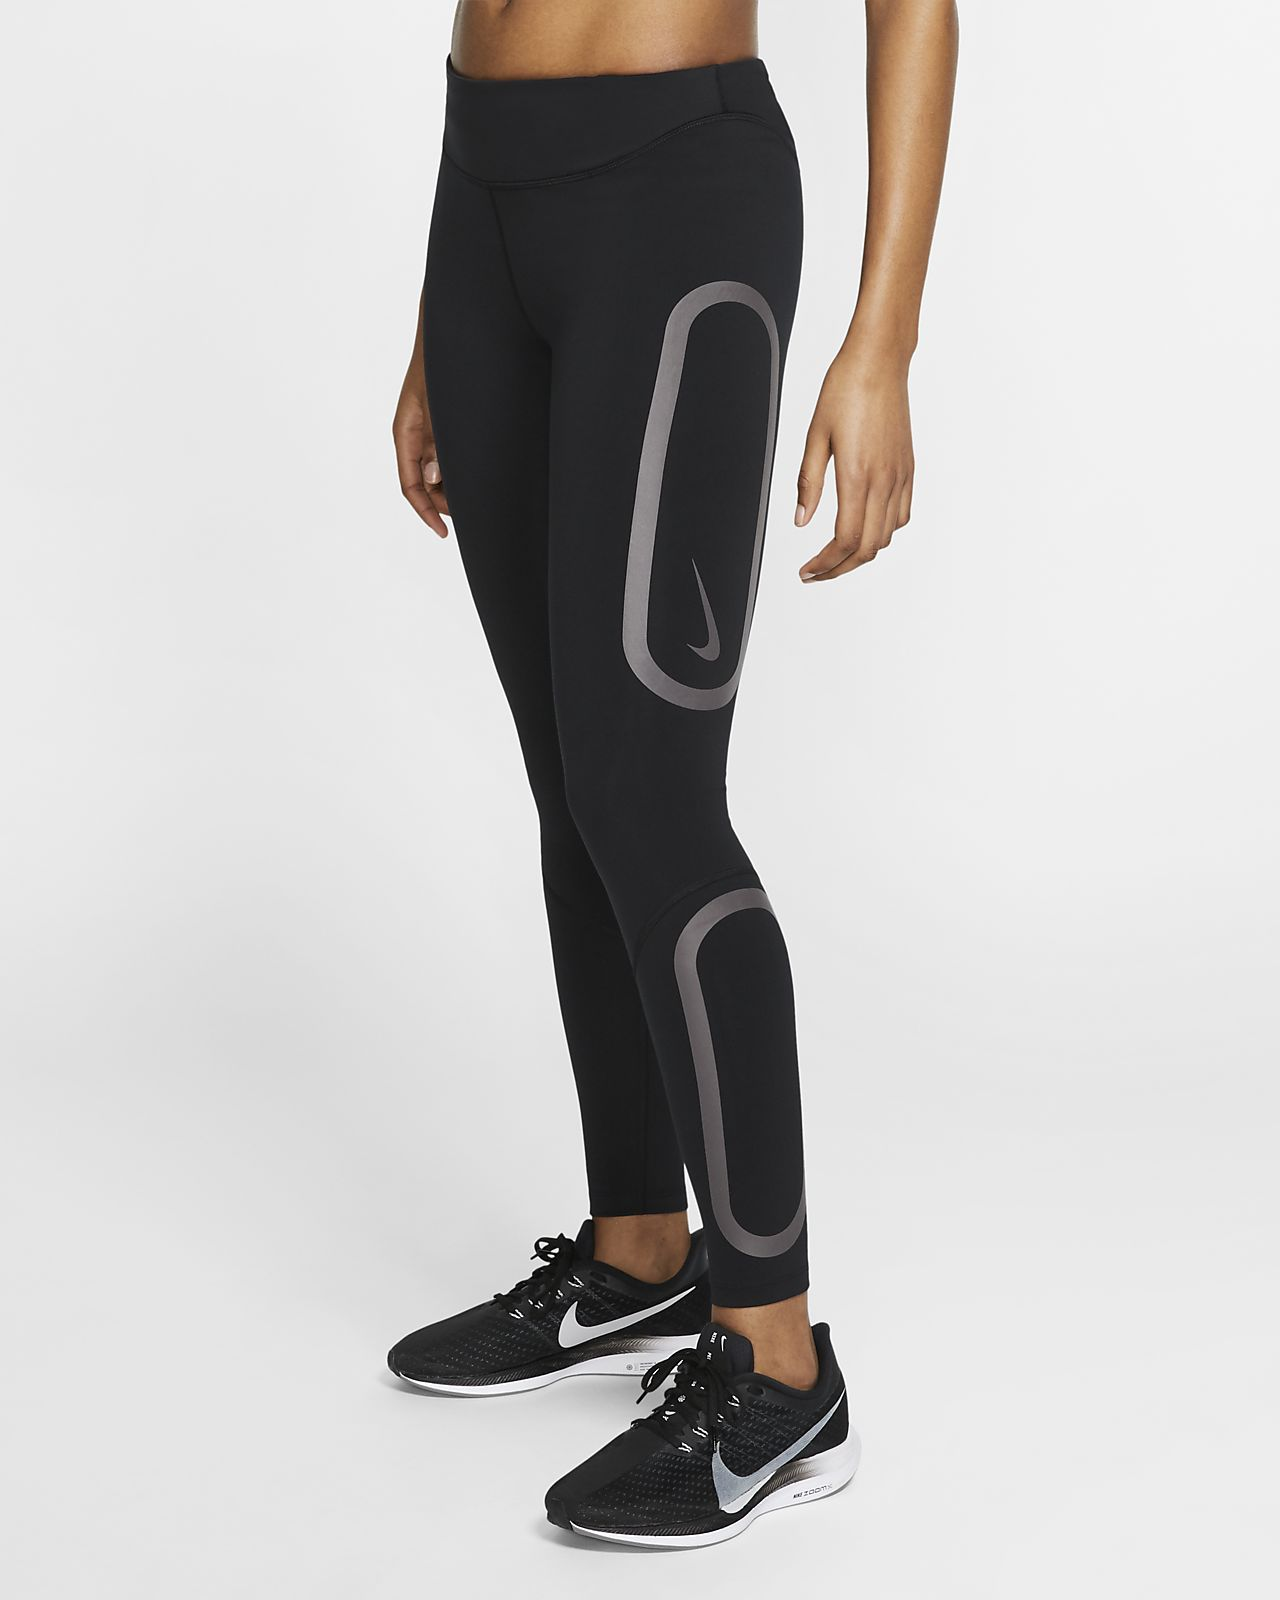 Nike Epic Lux Damen Lauftights mit Grafik